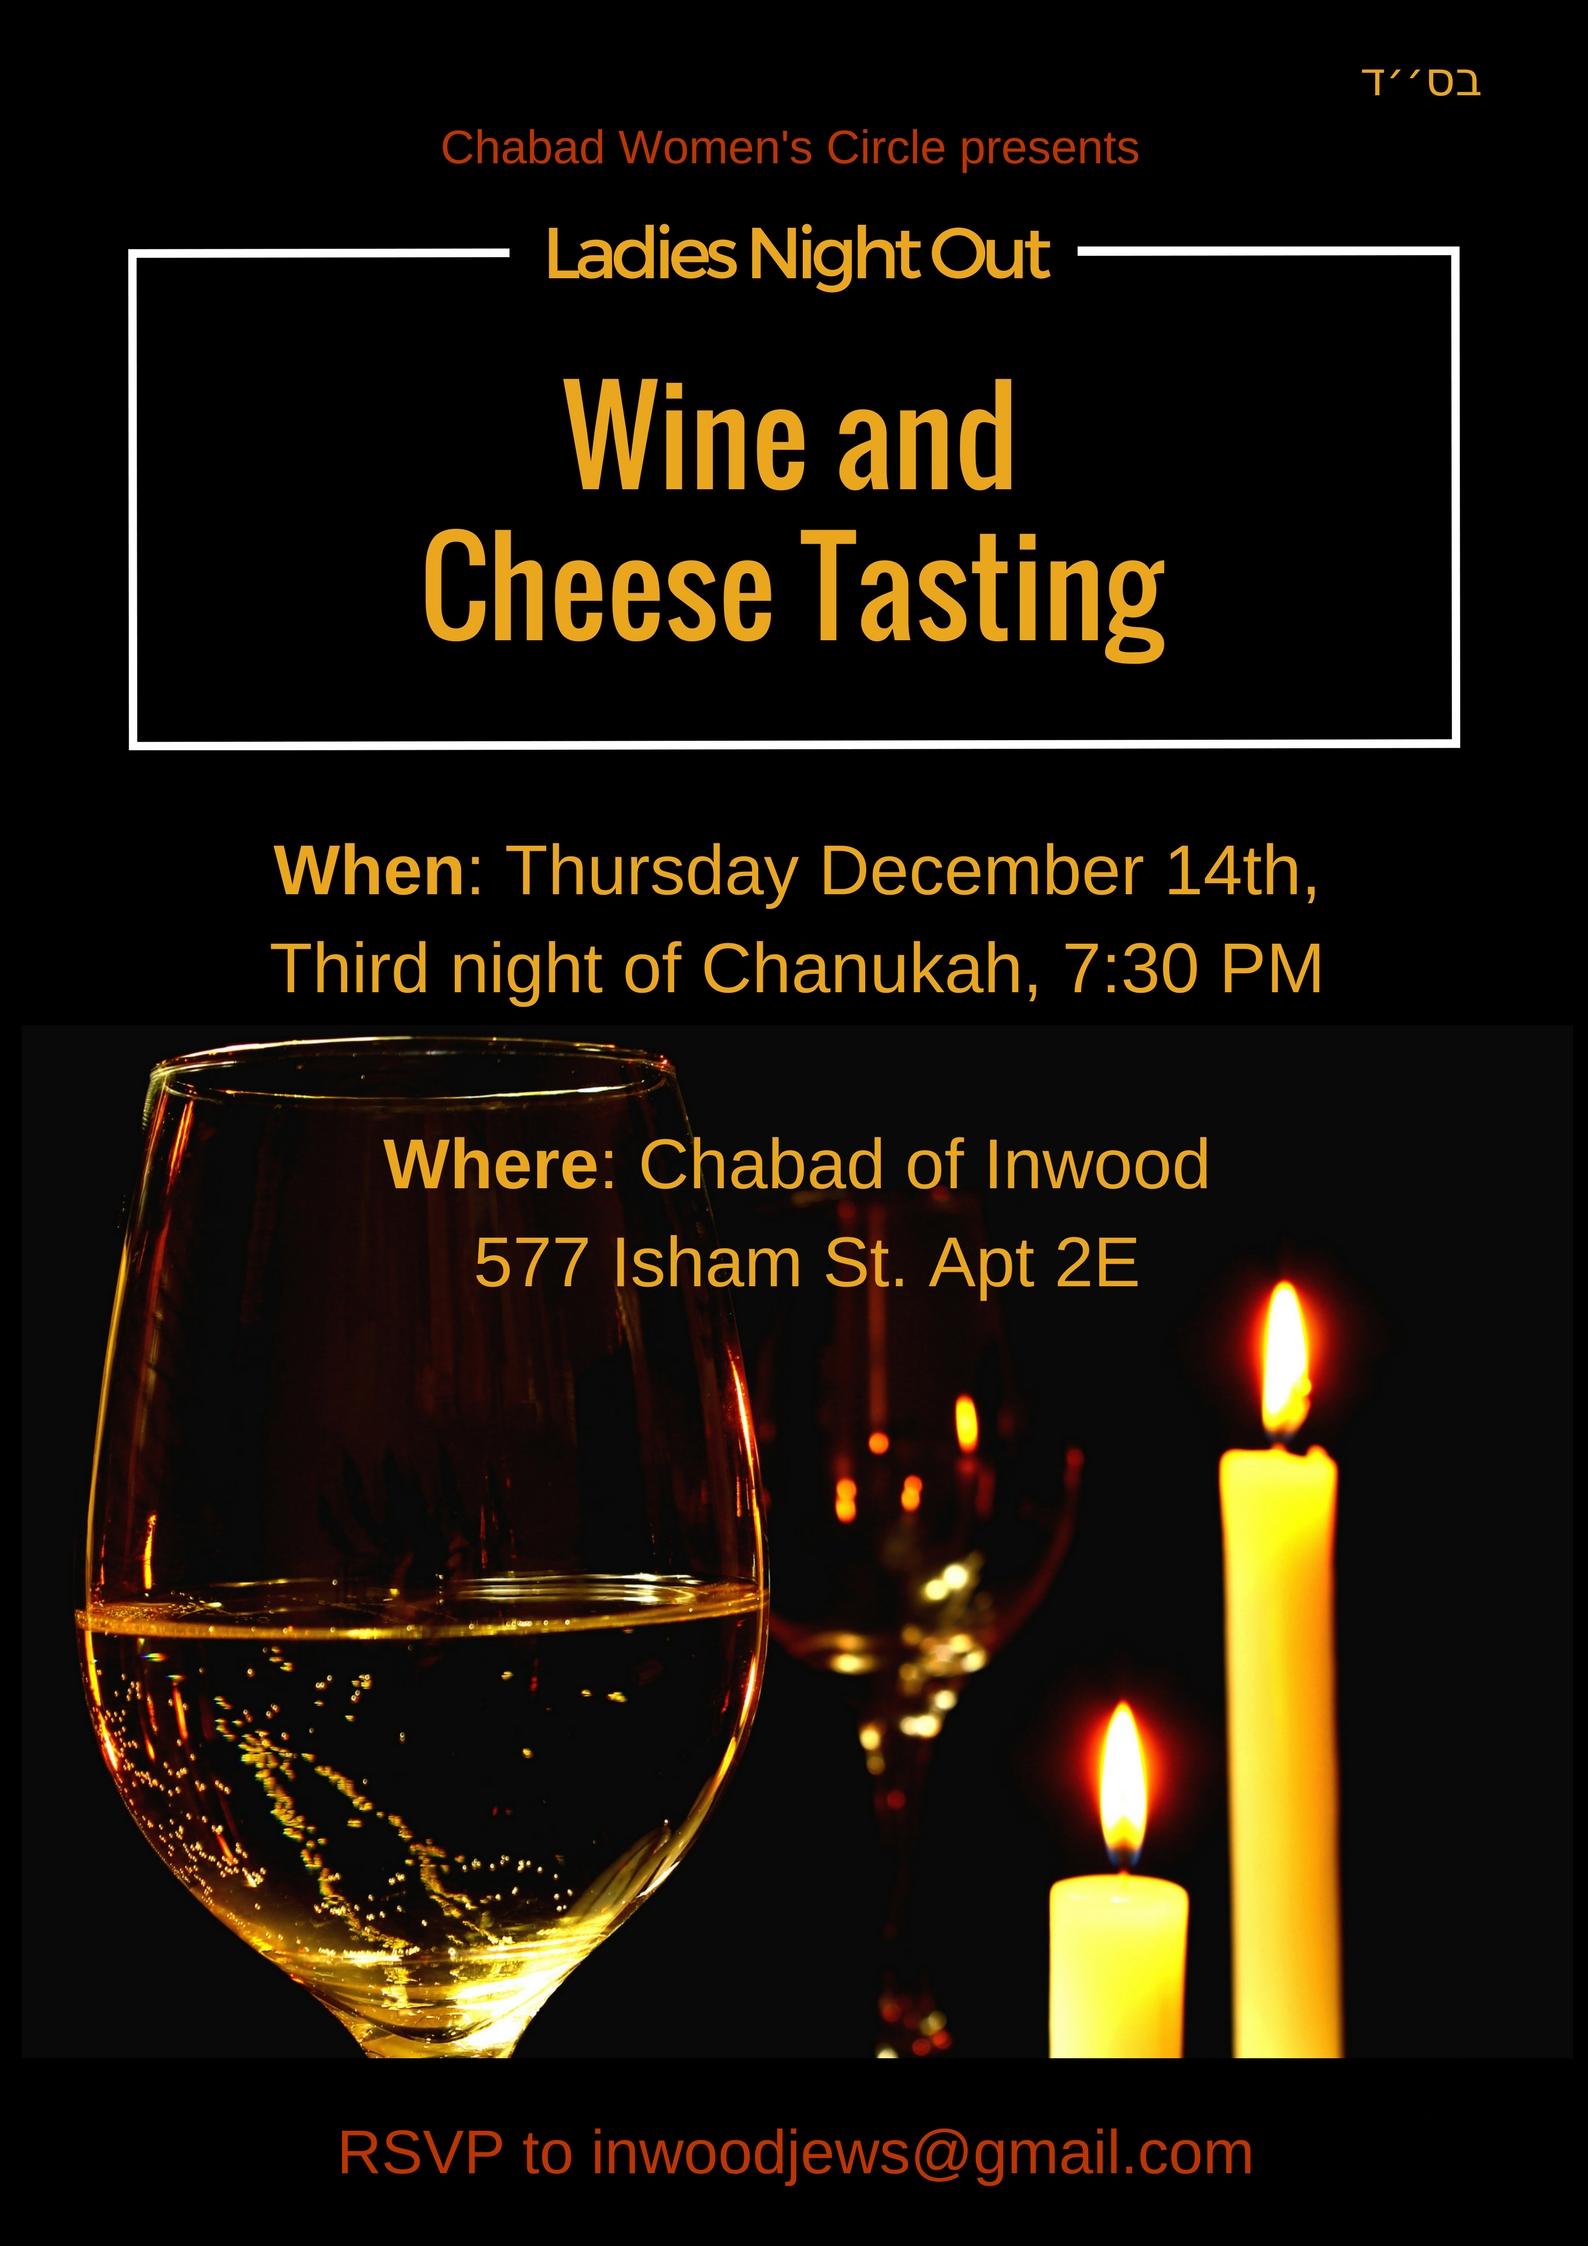 Chanukah StyleWine and Cheese Tasting (2).jpg